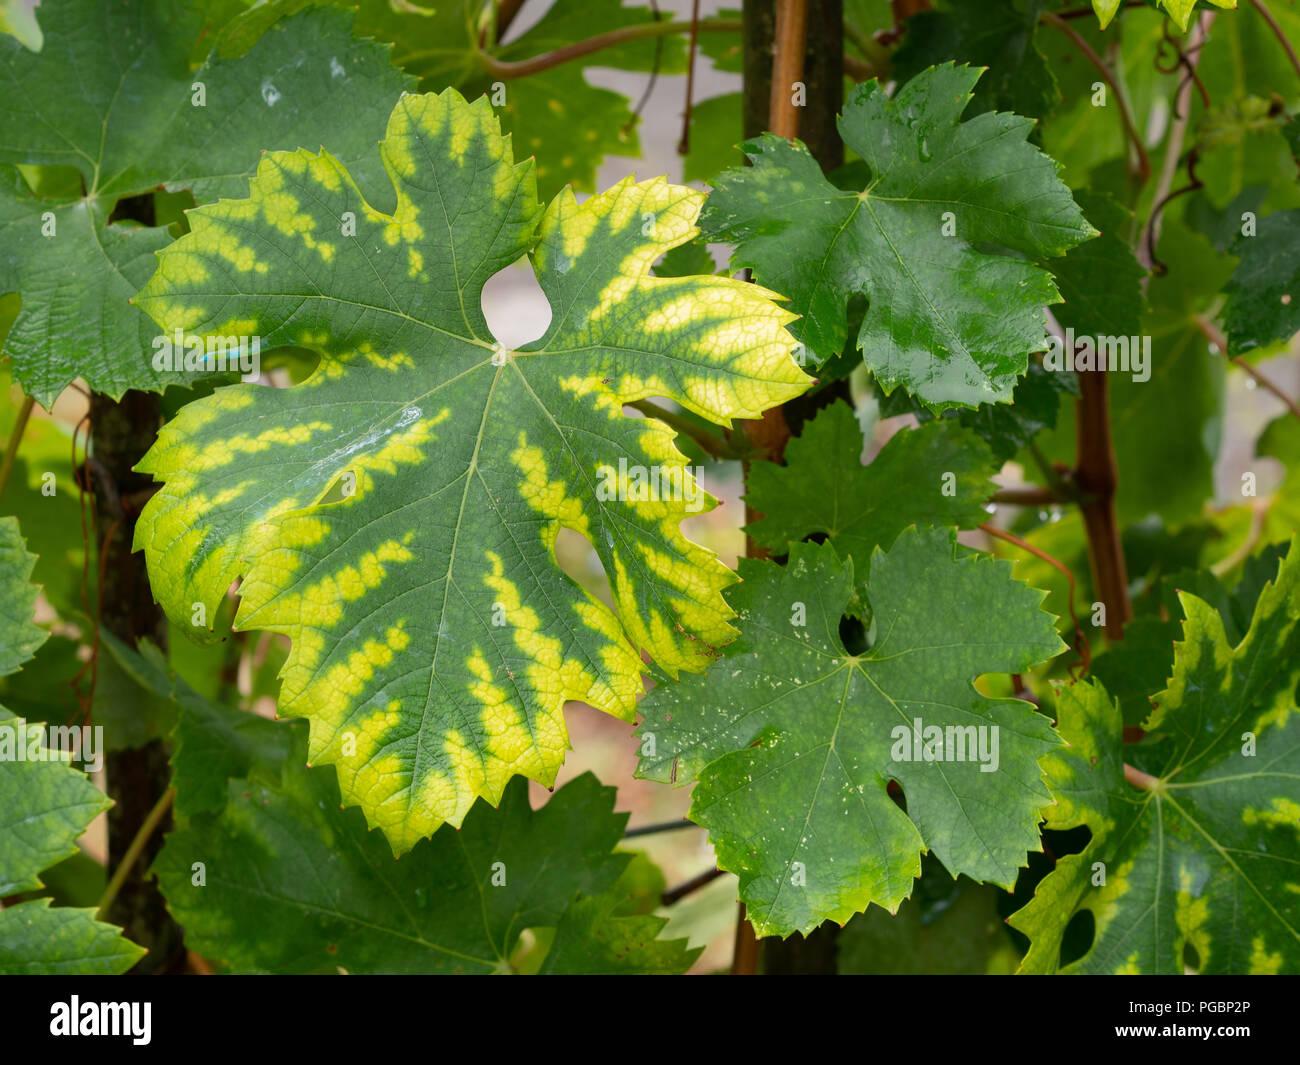 Chlorosis Stock Photos & Chlorosis Stock Images - Alamy